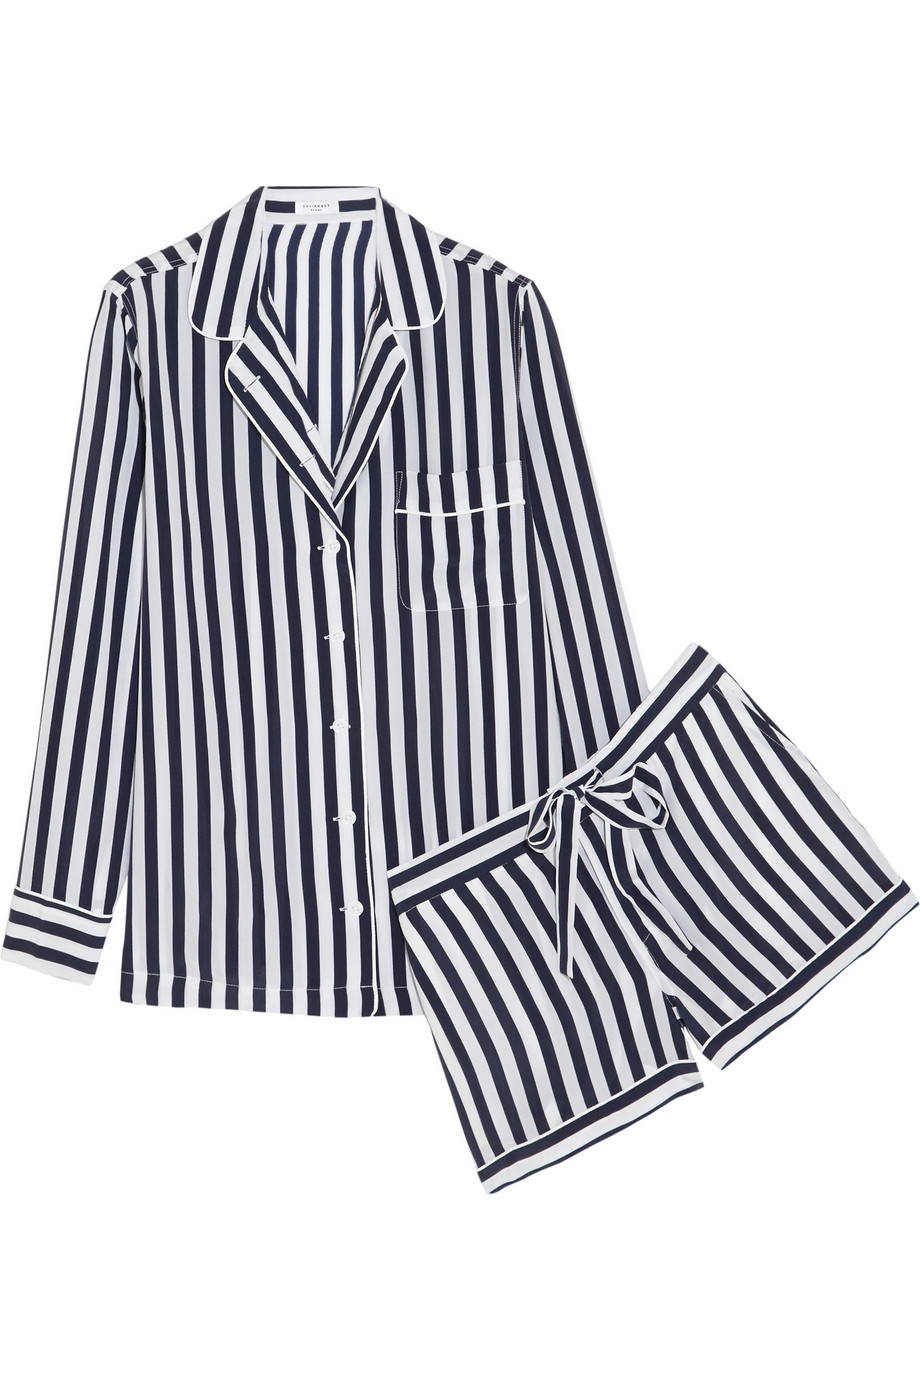 Lyst - Equipment Lilian Striped Washed-Silk Pajama Set in White cbf9c1826